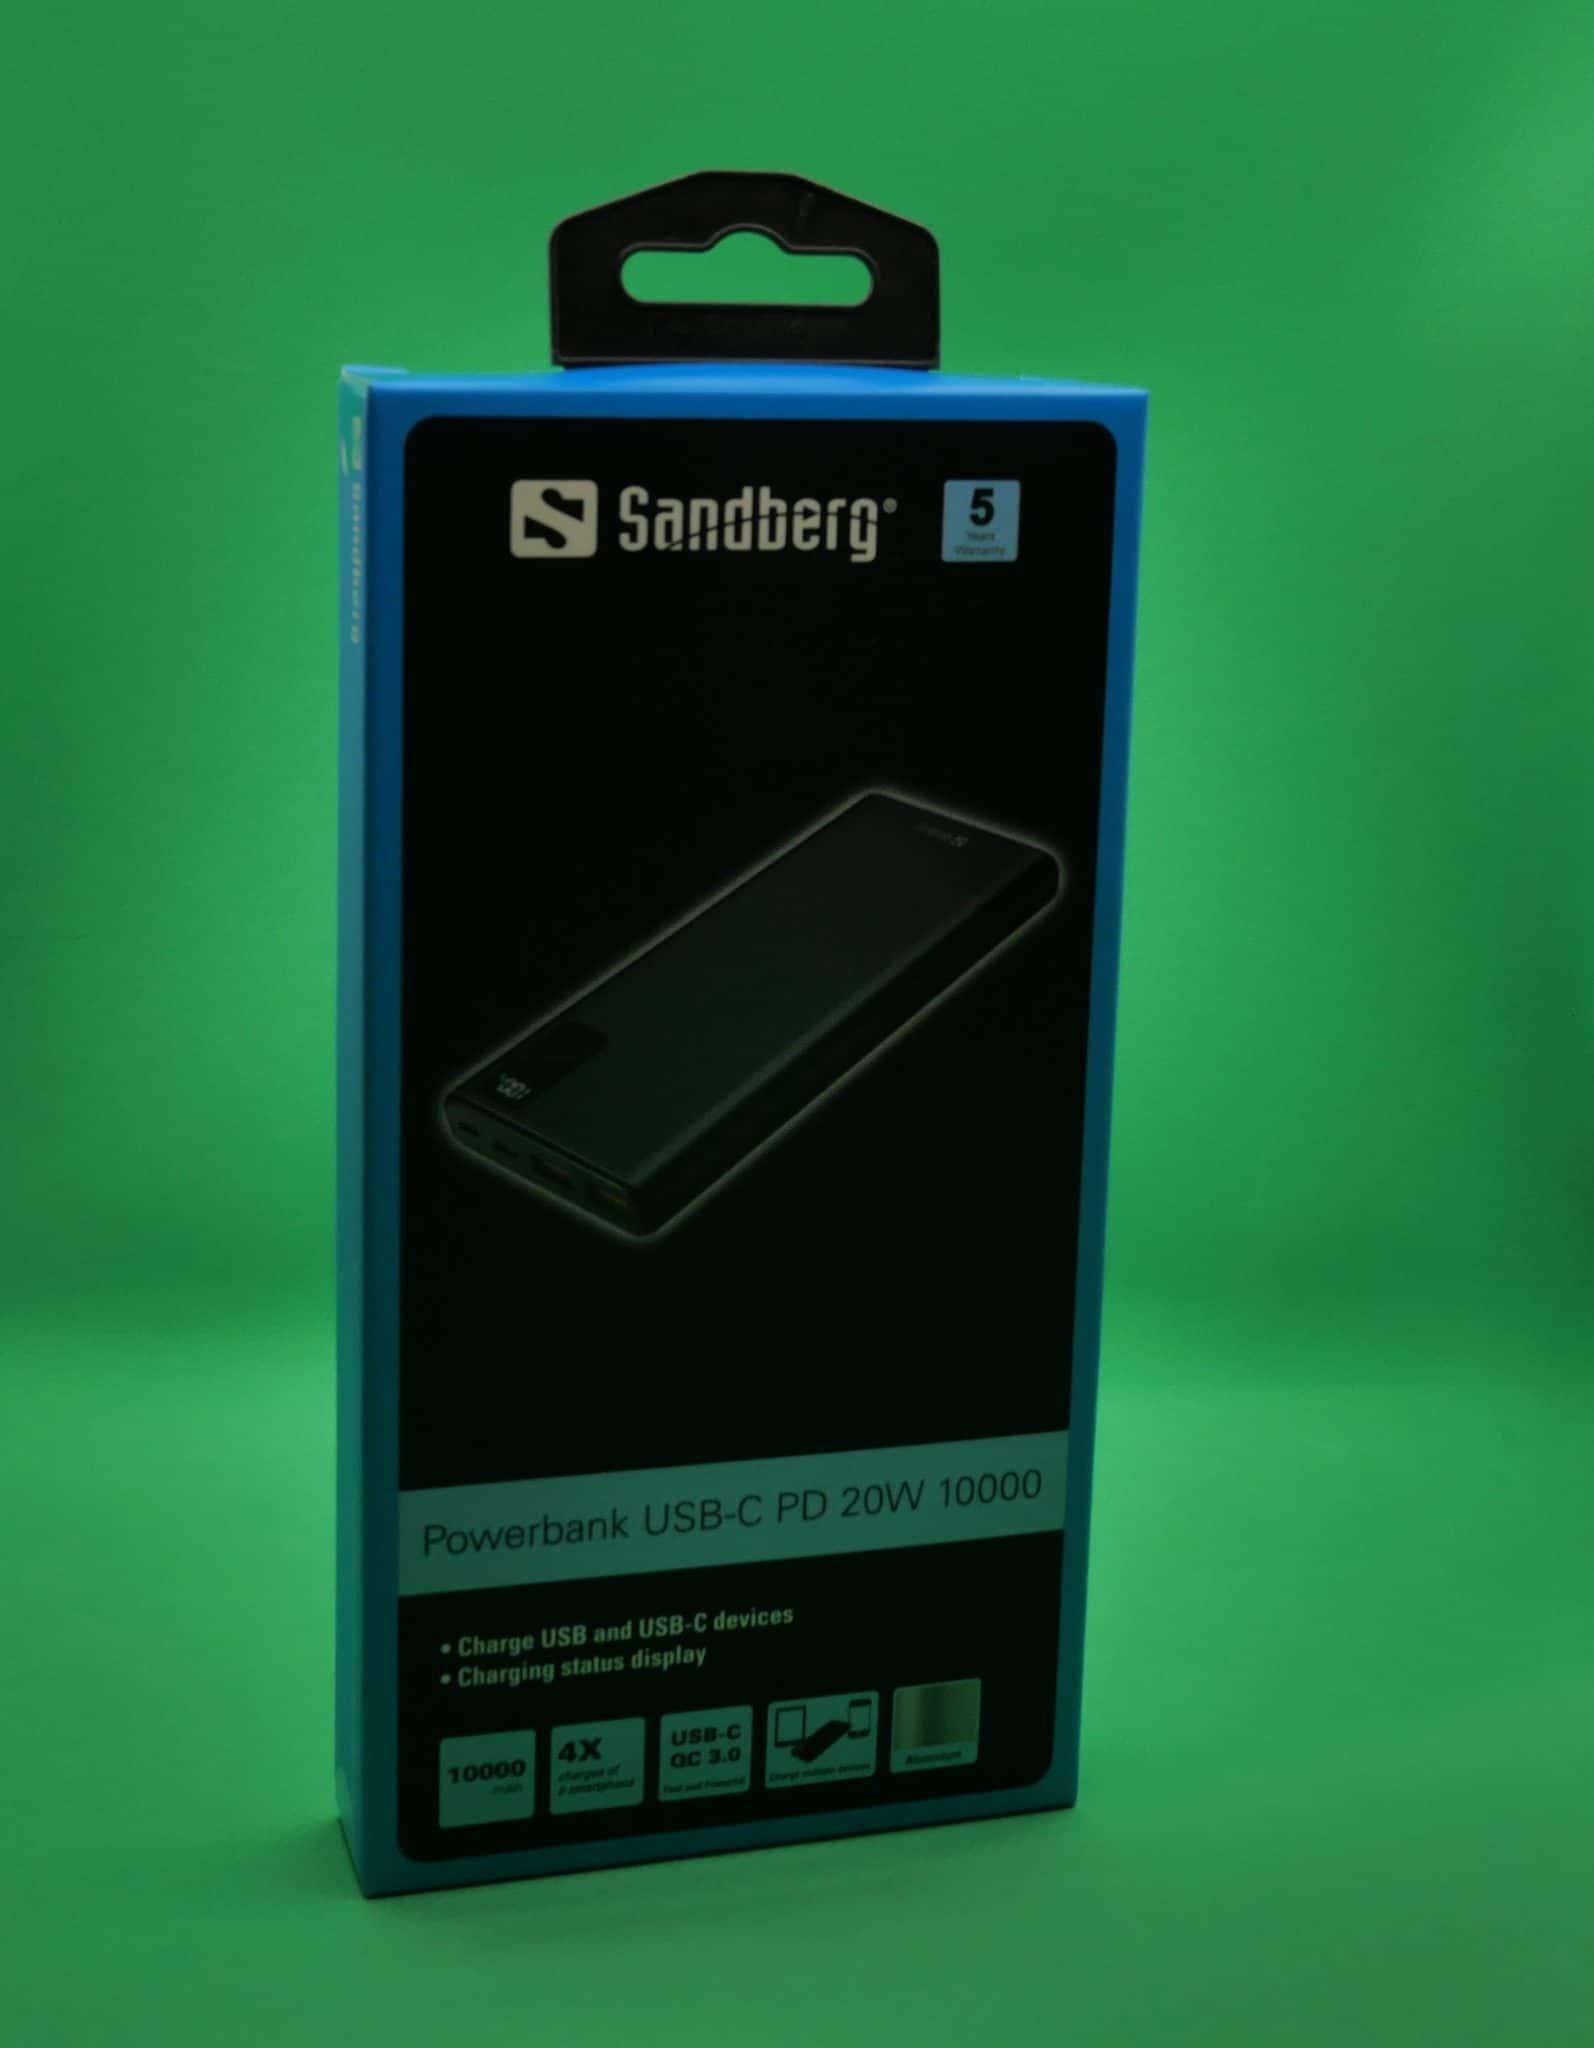 Powerbank Sandberg USB-C PD 20W 10000 pack